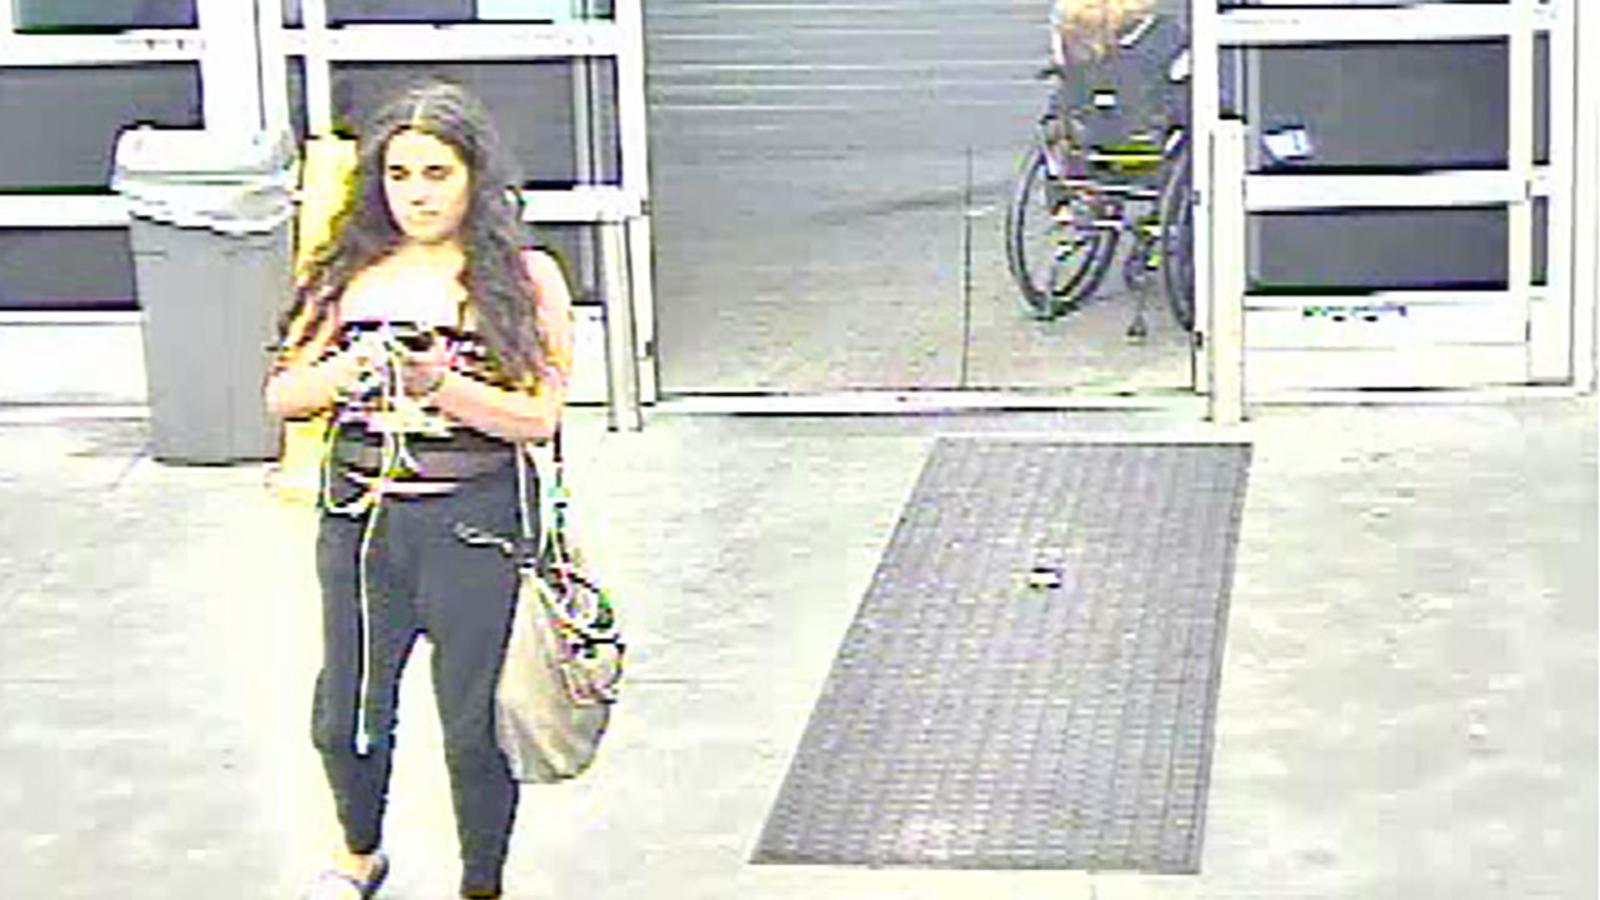 Police seek woman who urinated on potatoes in Walmart